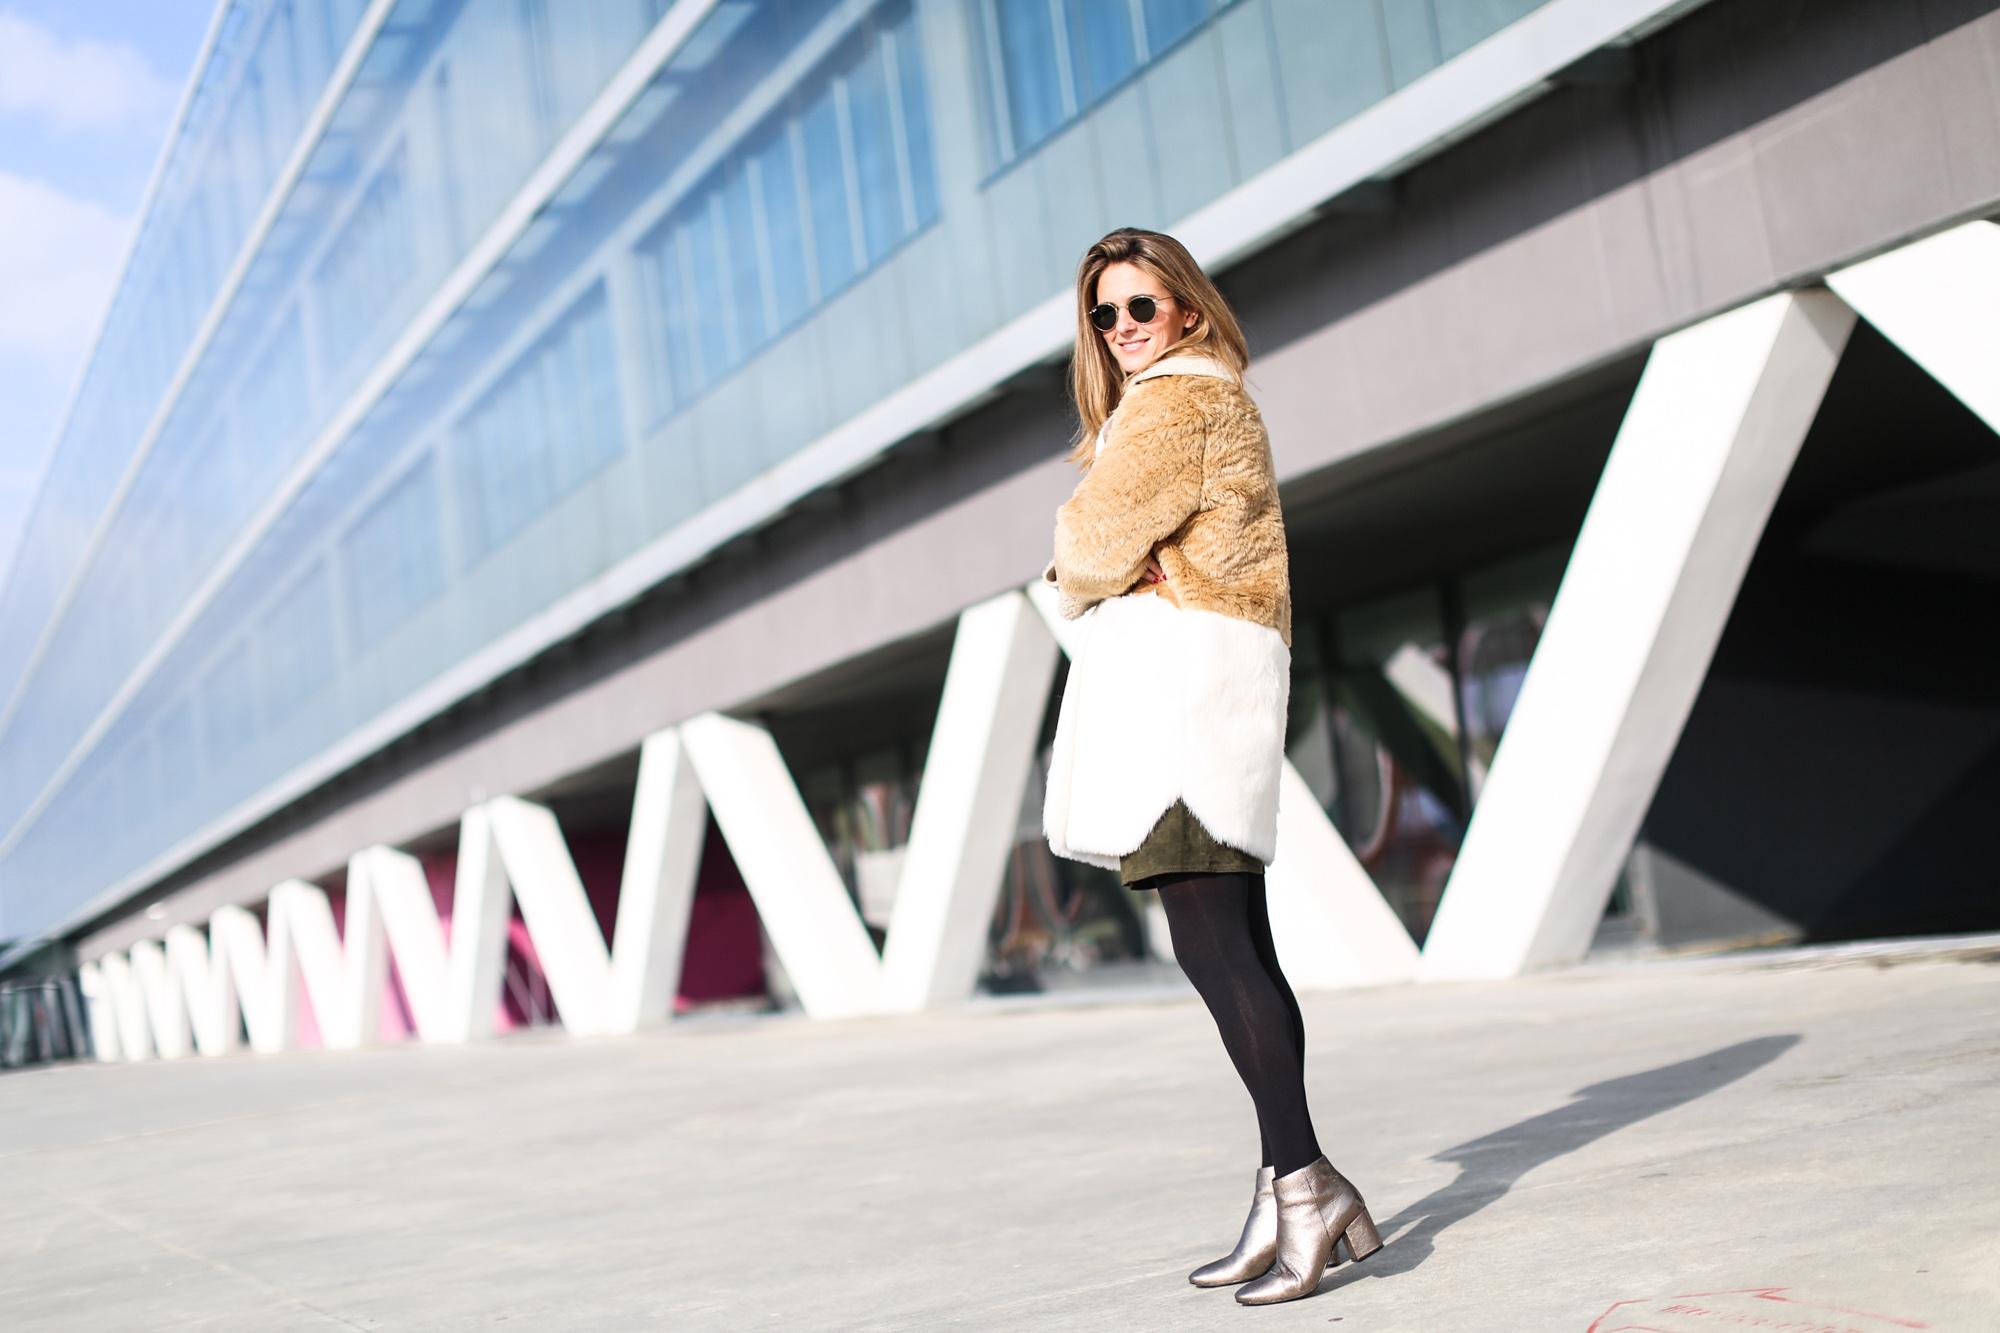 Clochet_streetstyle_fashionblogger_asosfauxfurcoat_minifaldaantezara_botinespieldorados-3